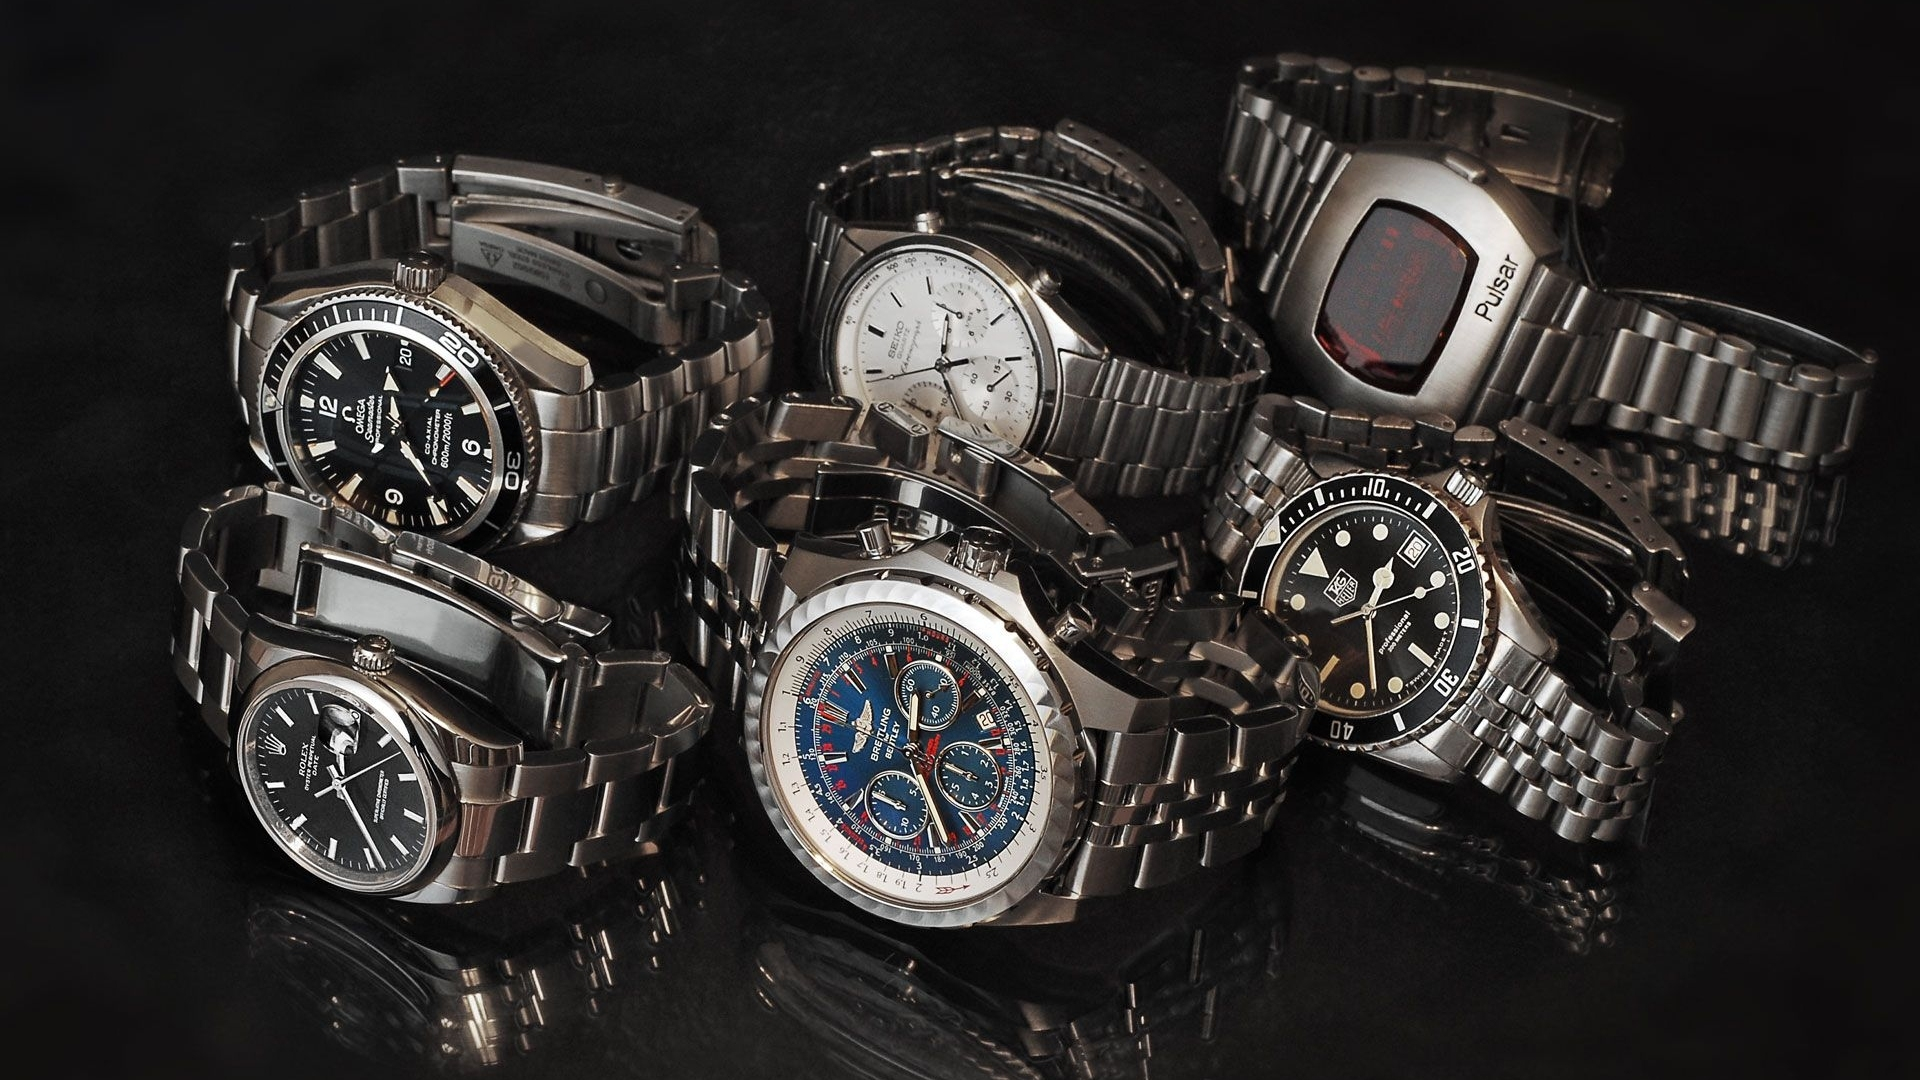 James bond Watches Rolex Wallpaper Background Full HD 1080p 1920x1080